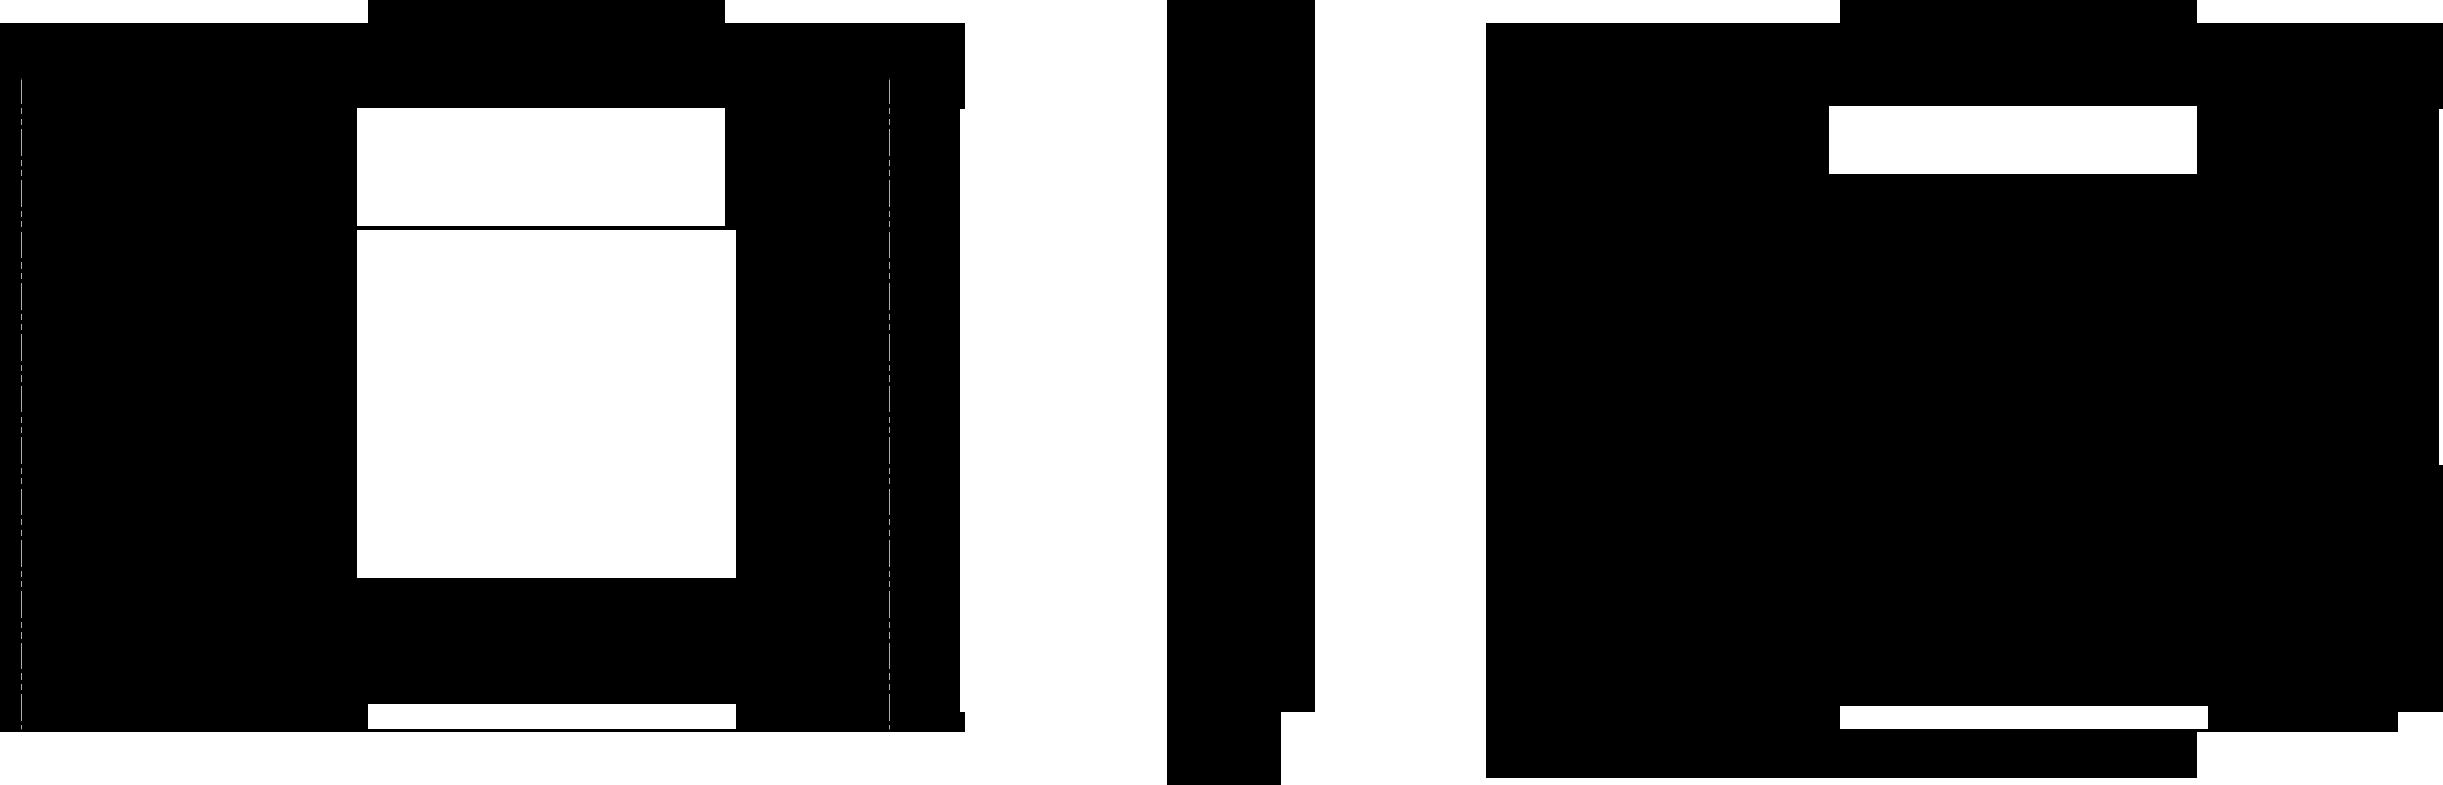 BCM101-HMI-SFERE商标尺寸图.png